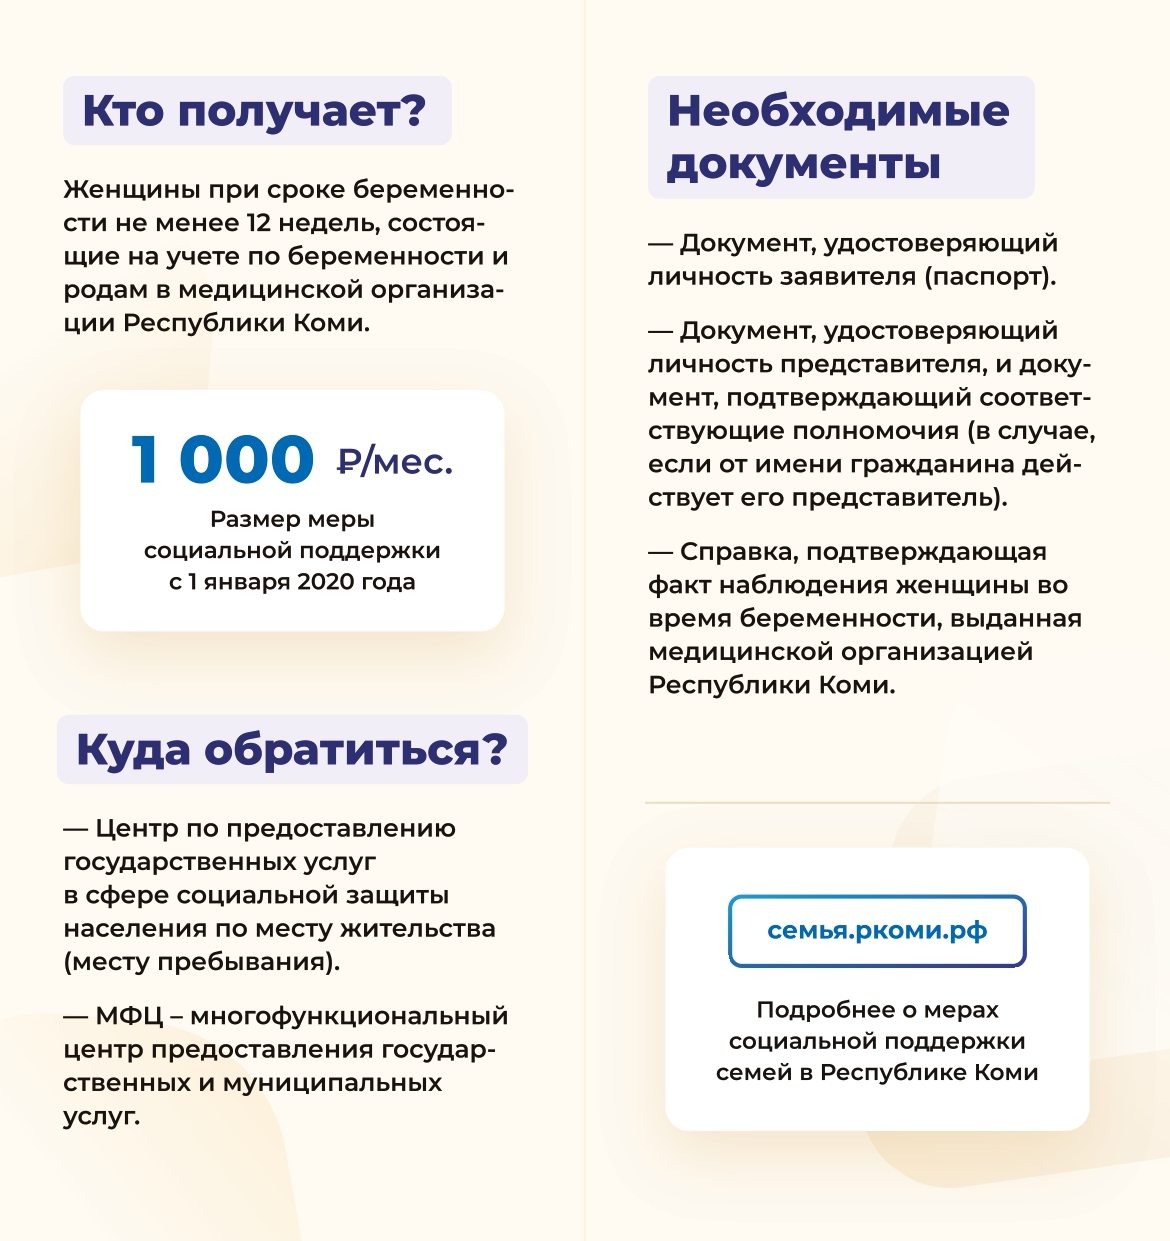 DLY-PECATI-BUKLET-1-FALT-VYPLATA-BEREMENNYM_page-0002.jpg